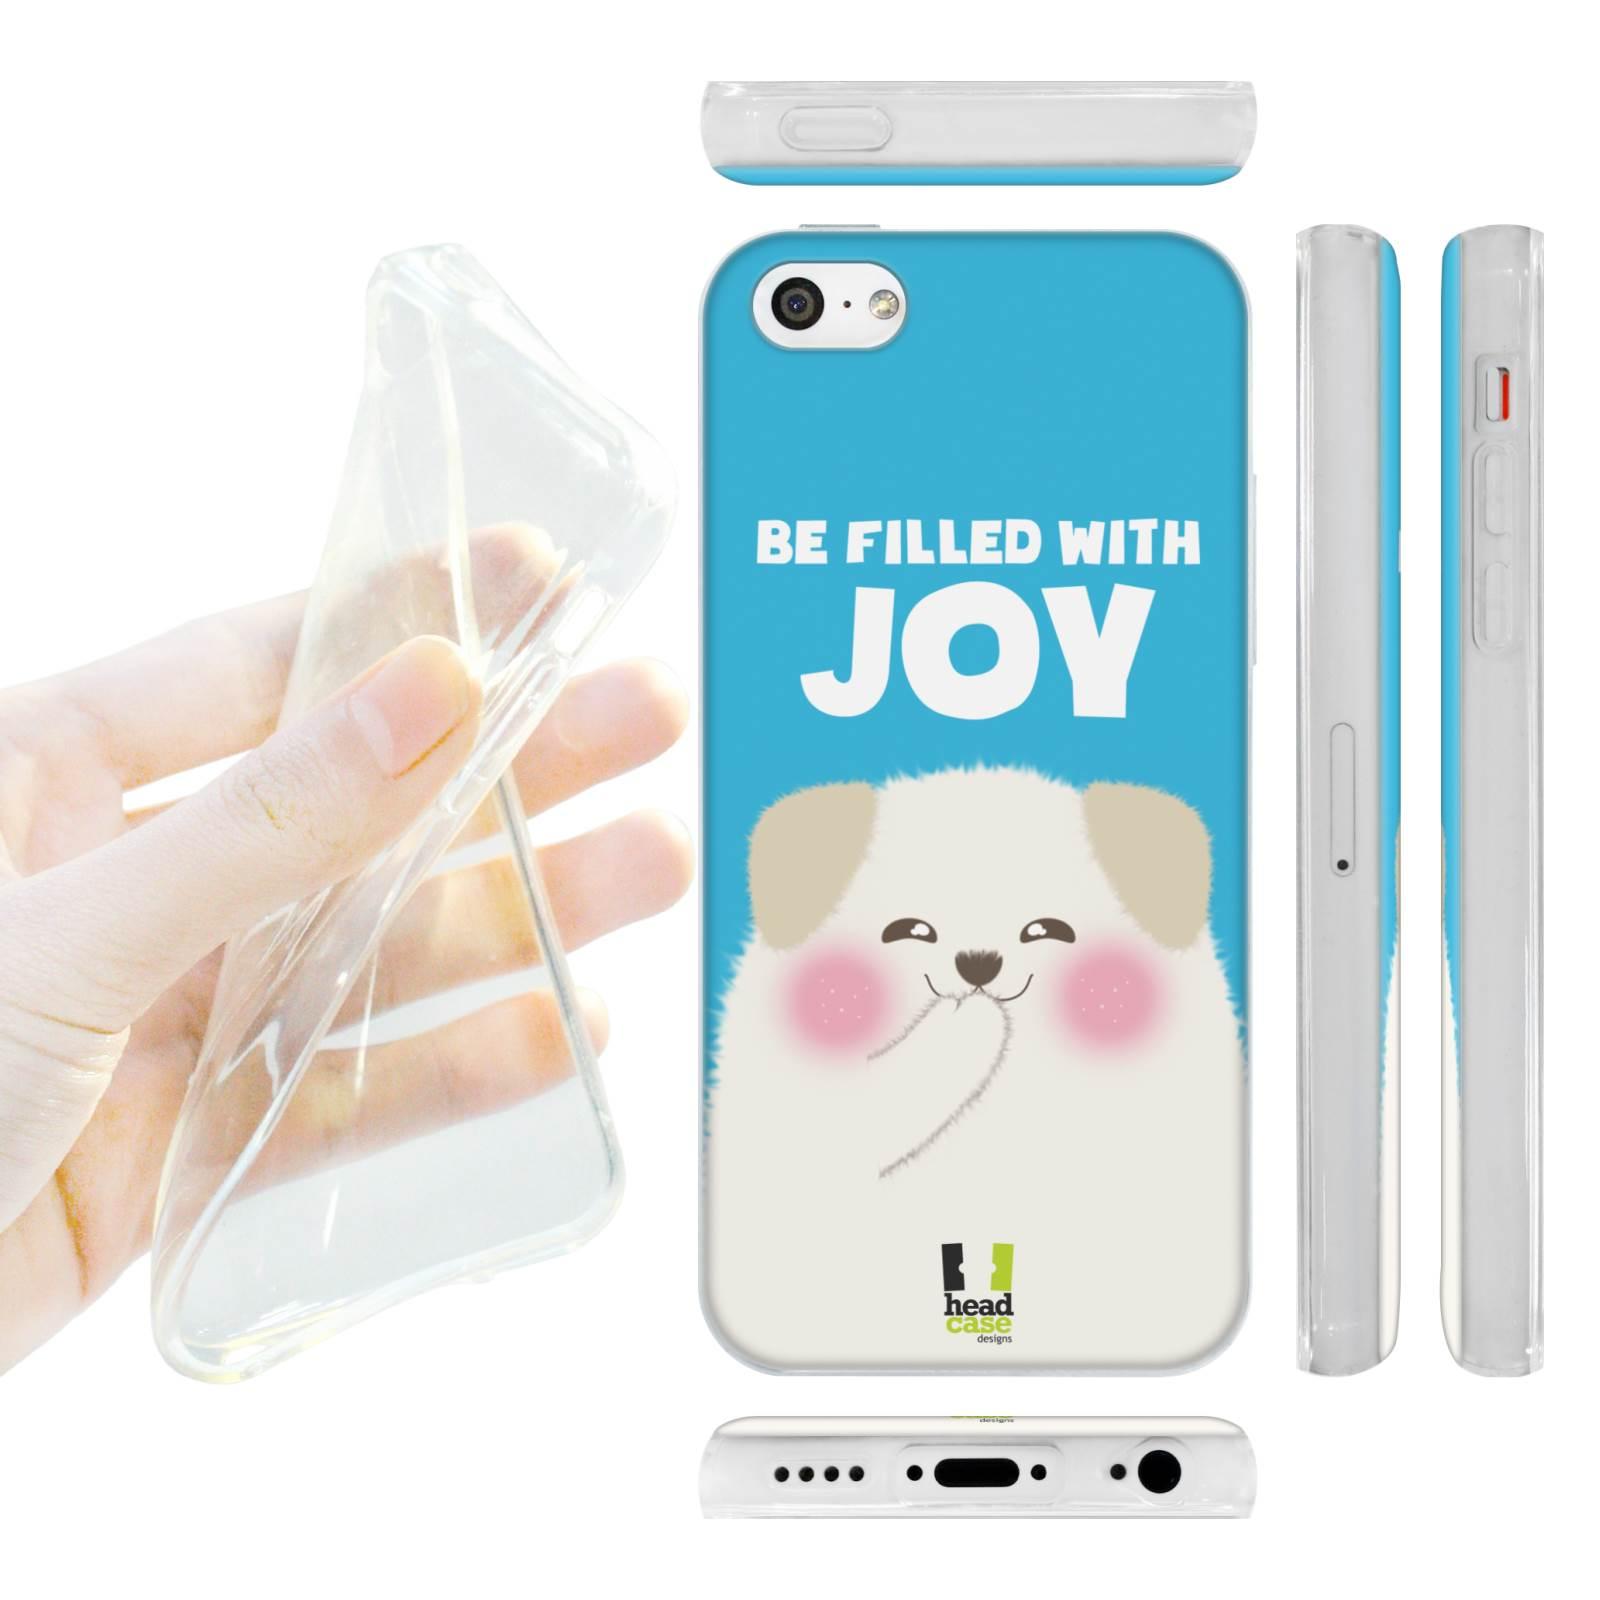 fa79f9a71 POUZDRO A OBAL NA MOBIL | HEAD CASE silikonový obal na mobil Iphone ...